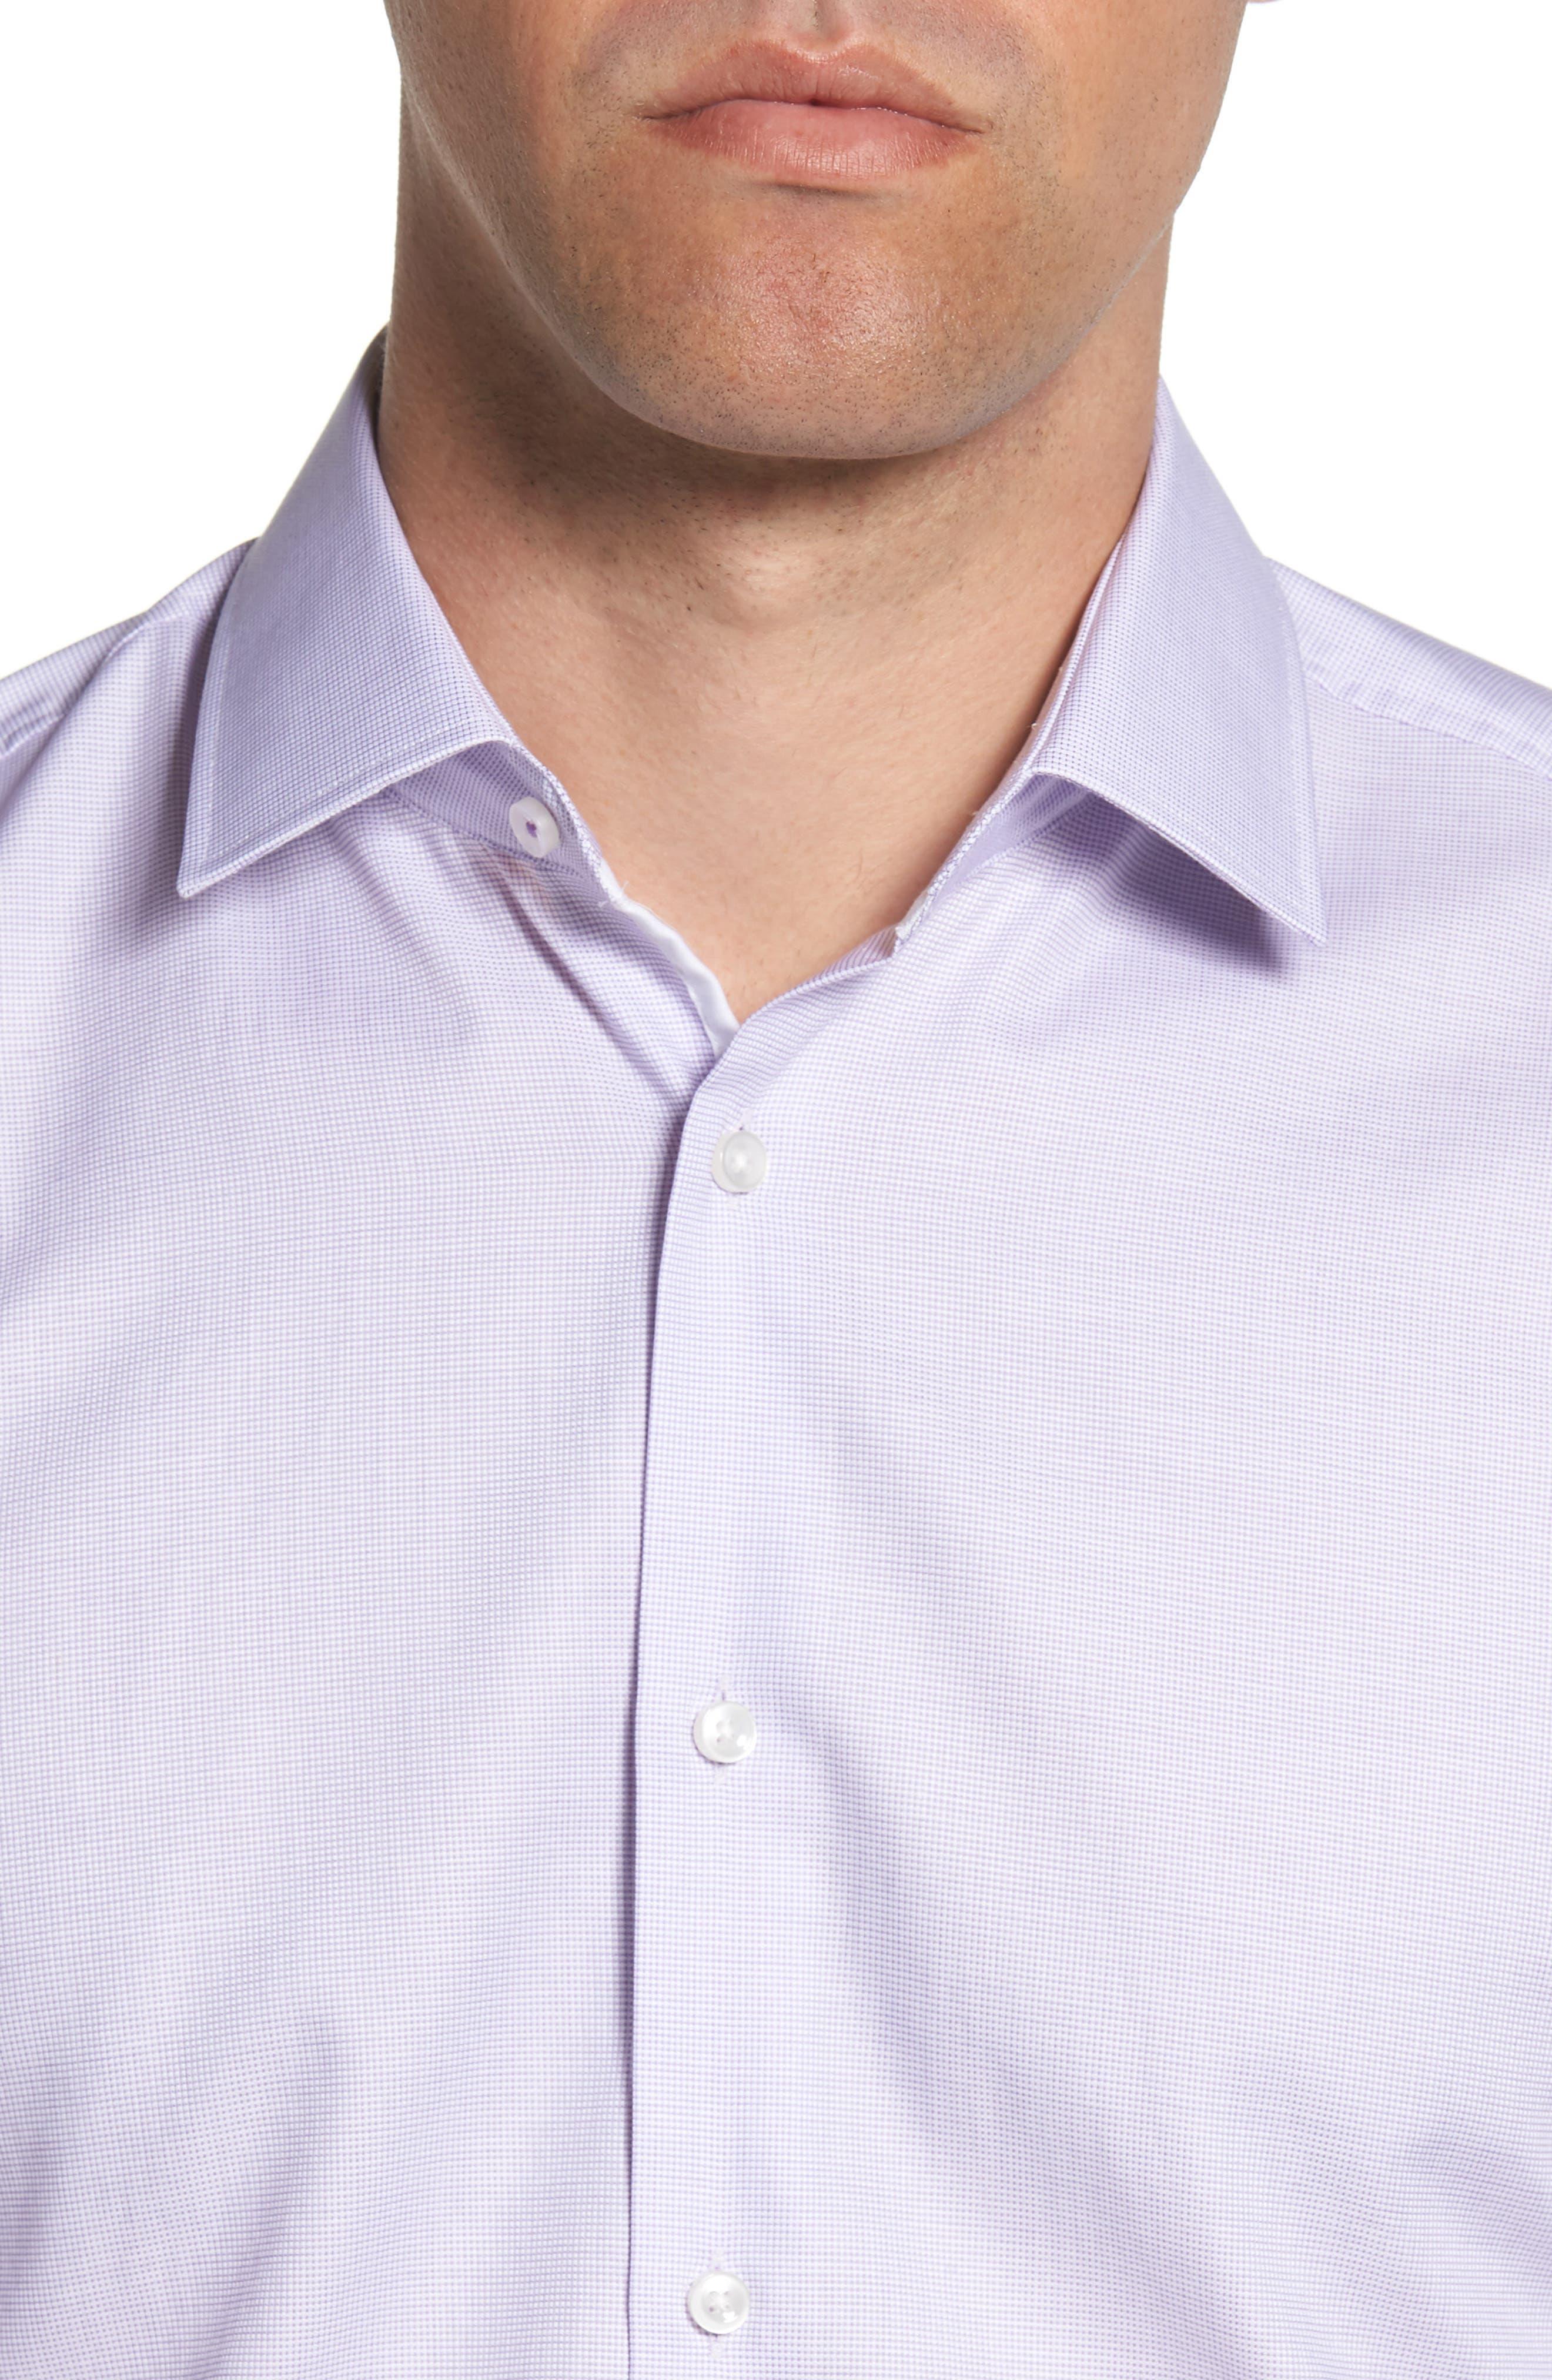 Jesse Slim Fit Dress Shirt,                             Alternate thumbnail 2, color,                             512